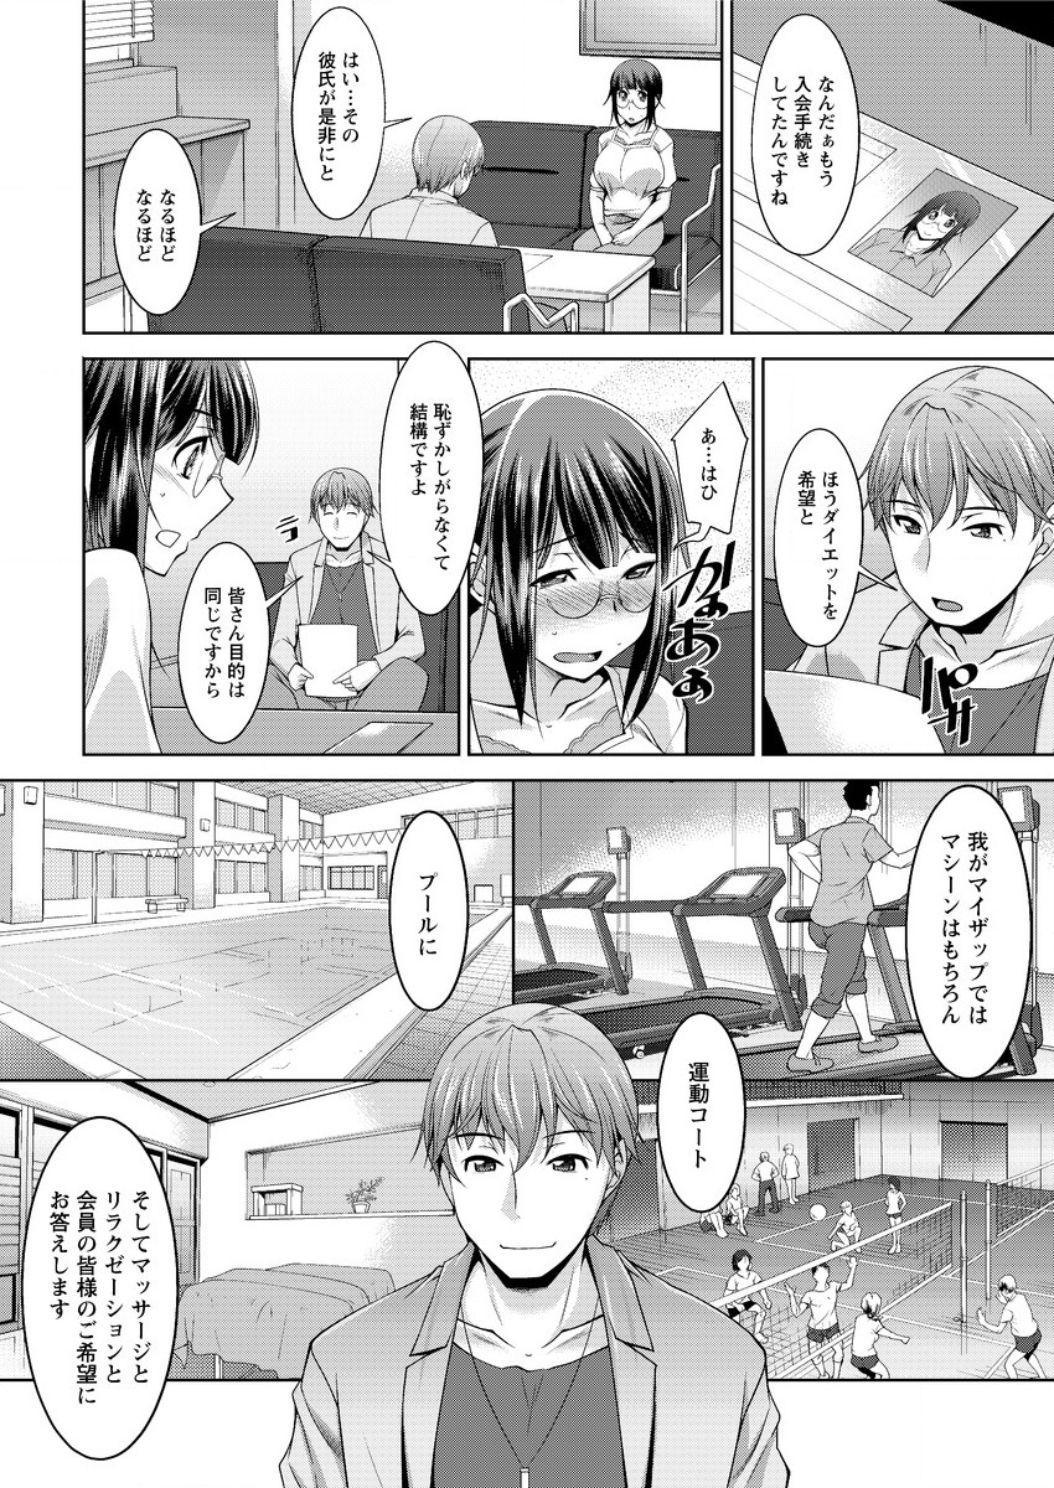 [zen9] Yacchae! Megumi-san | Do it! Megumi-san Ch 1-6 7